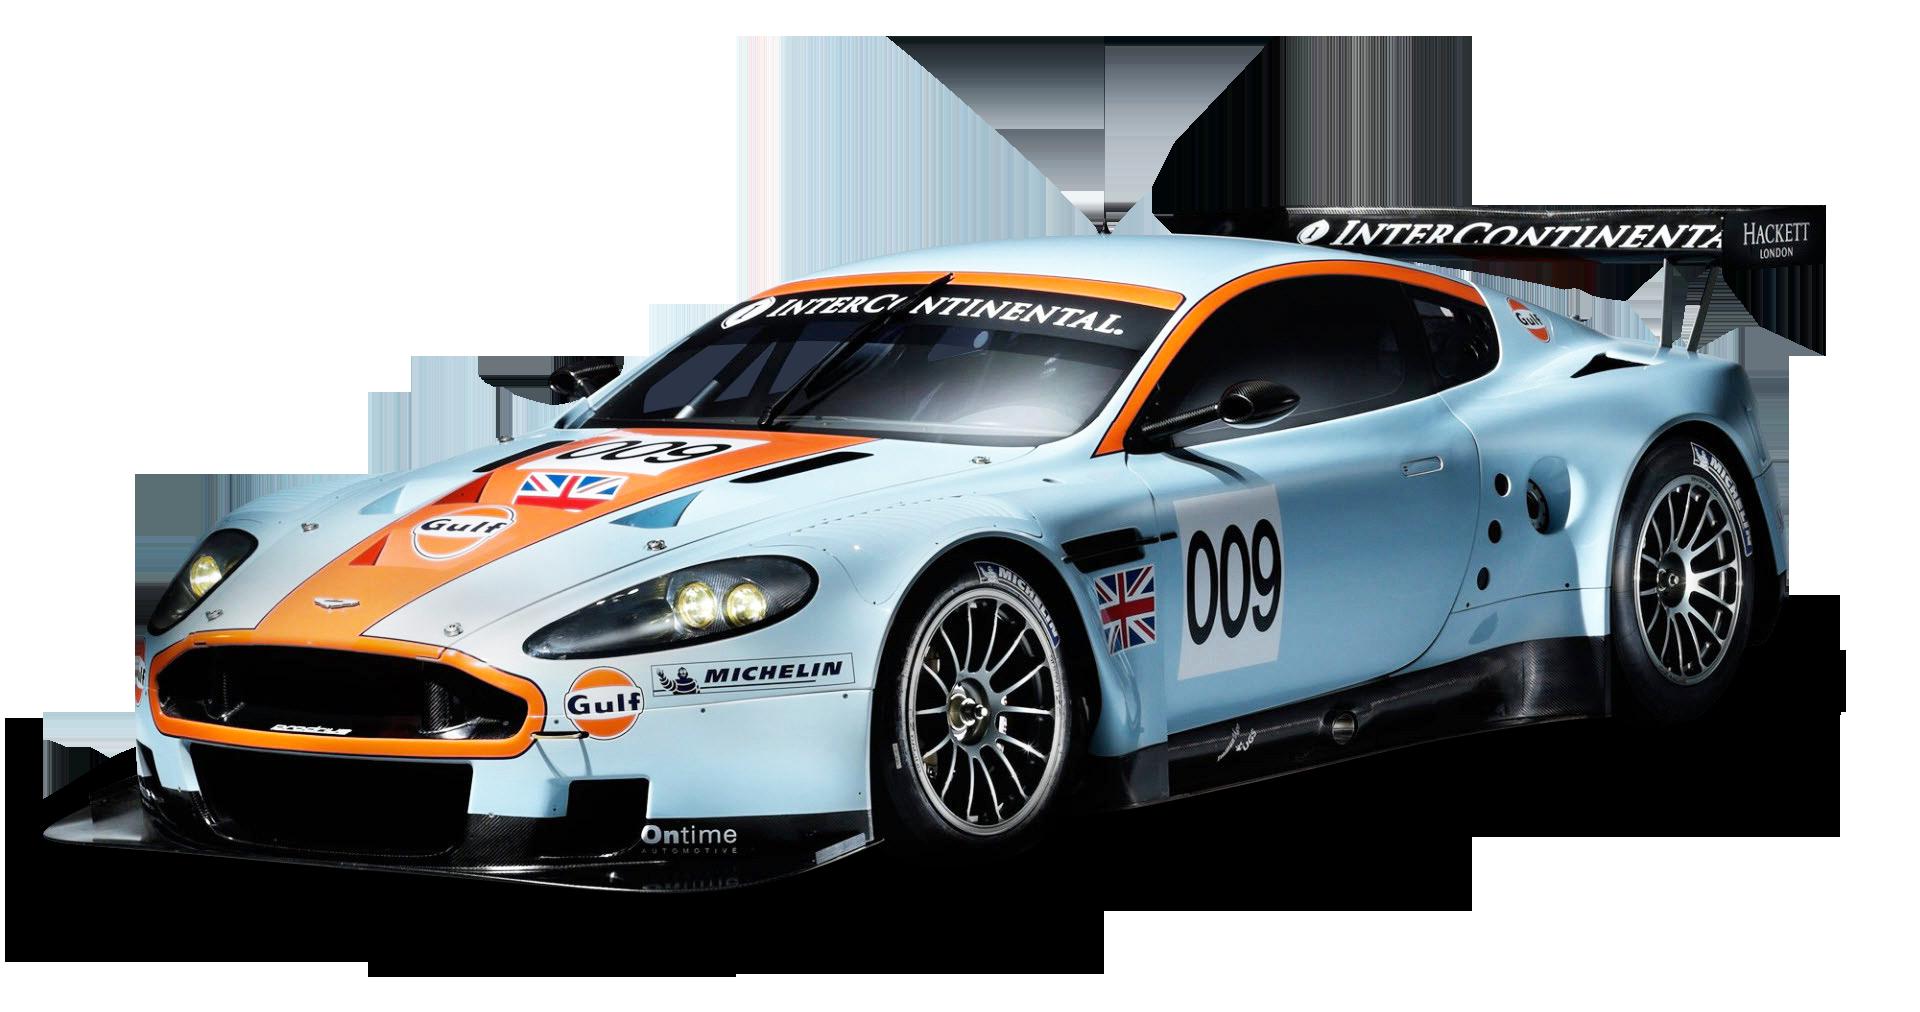 Aston Martin Racing Car PNG Image   PurePNG | Free Transparent CC0 PNG  Image Library